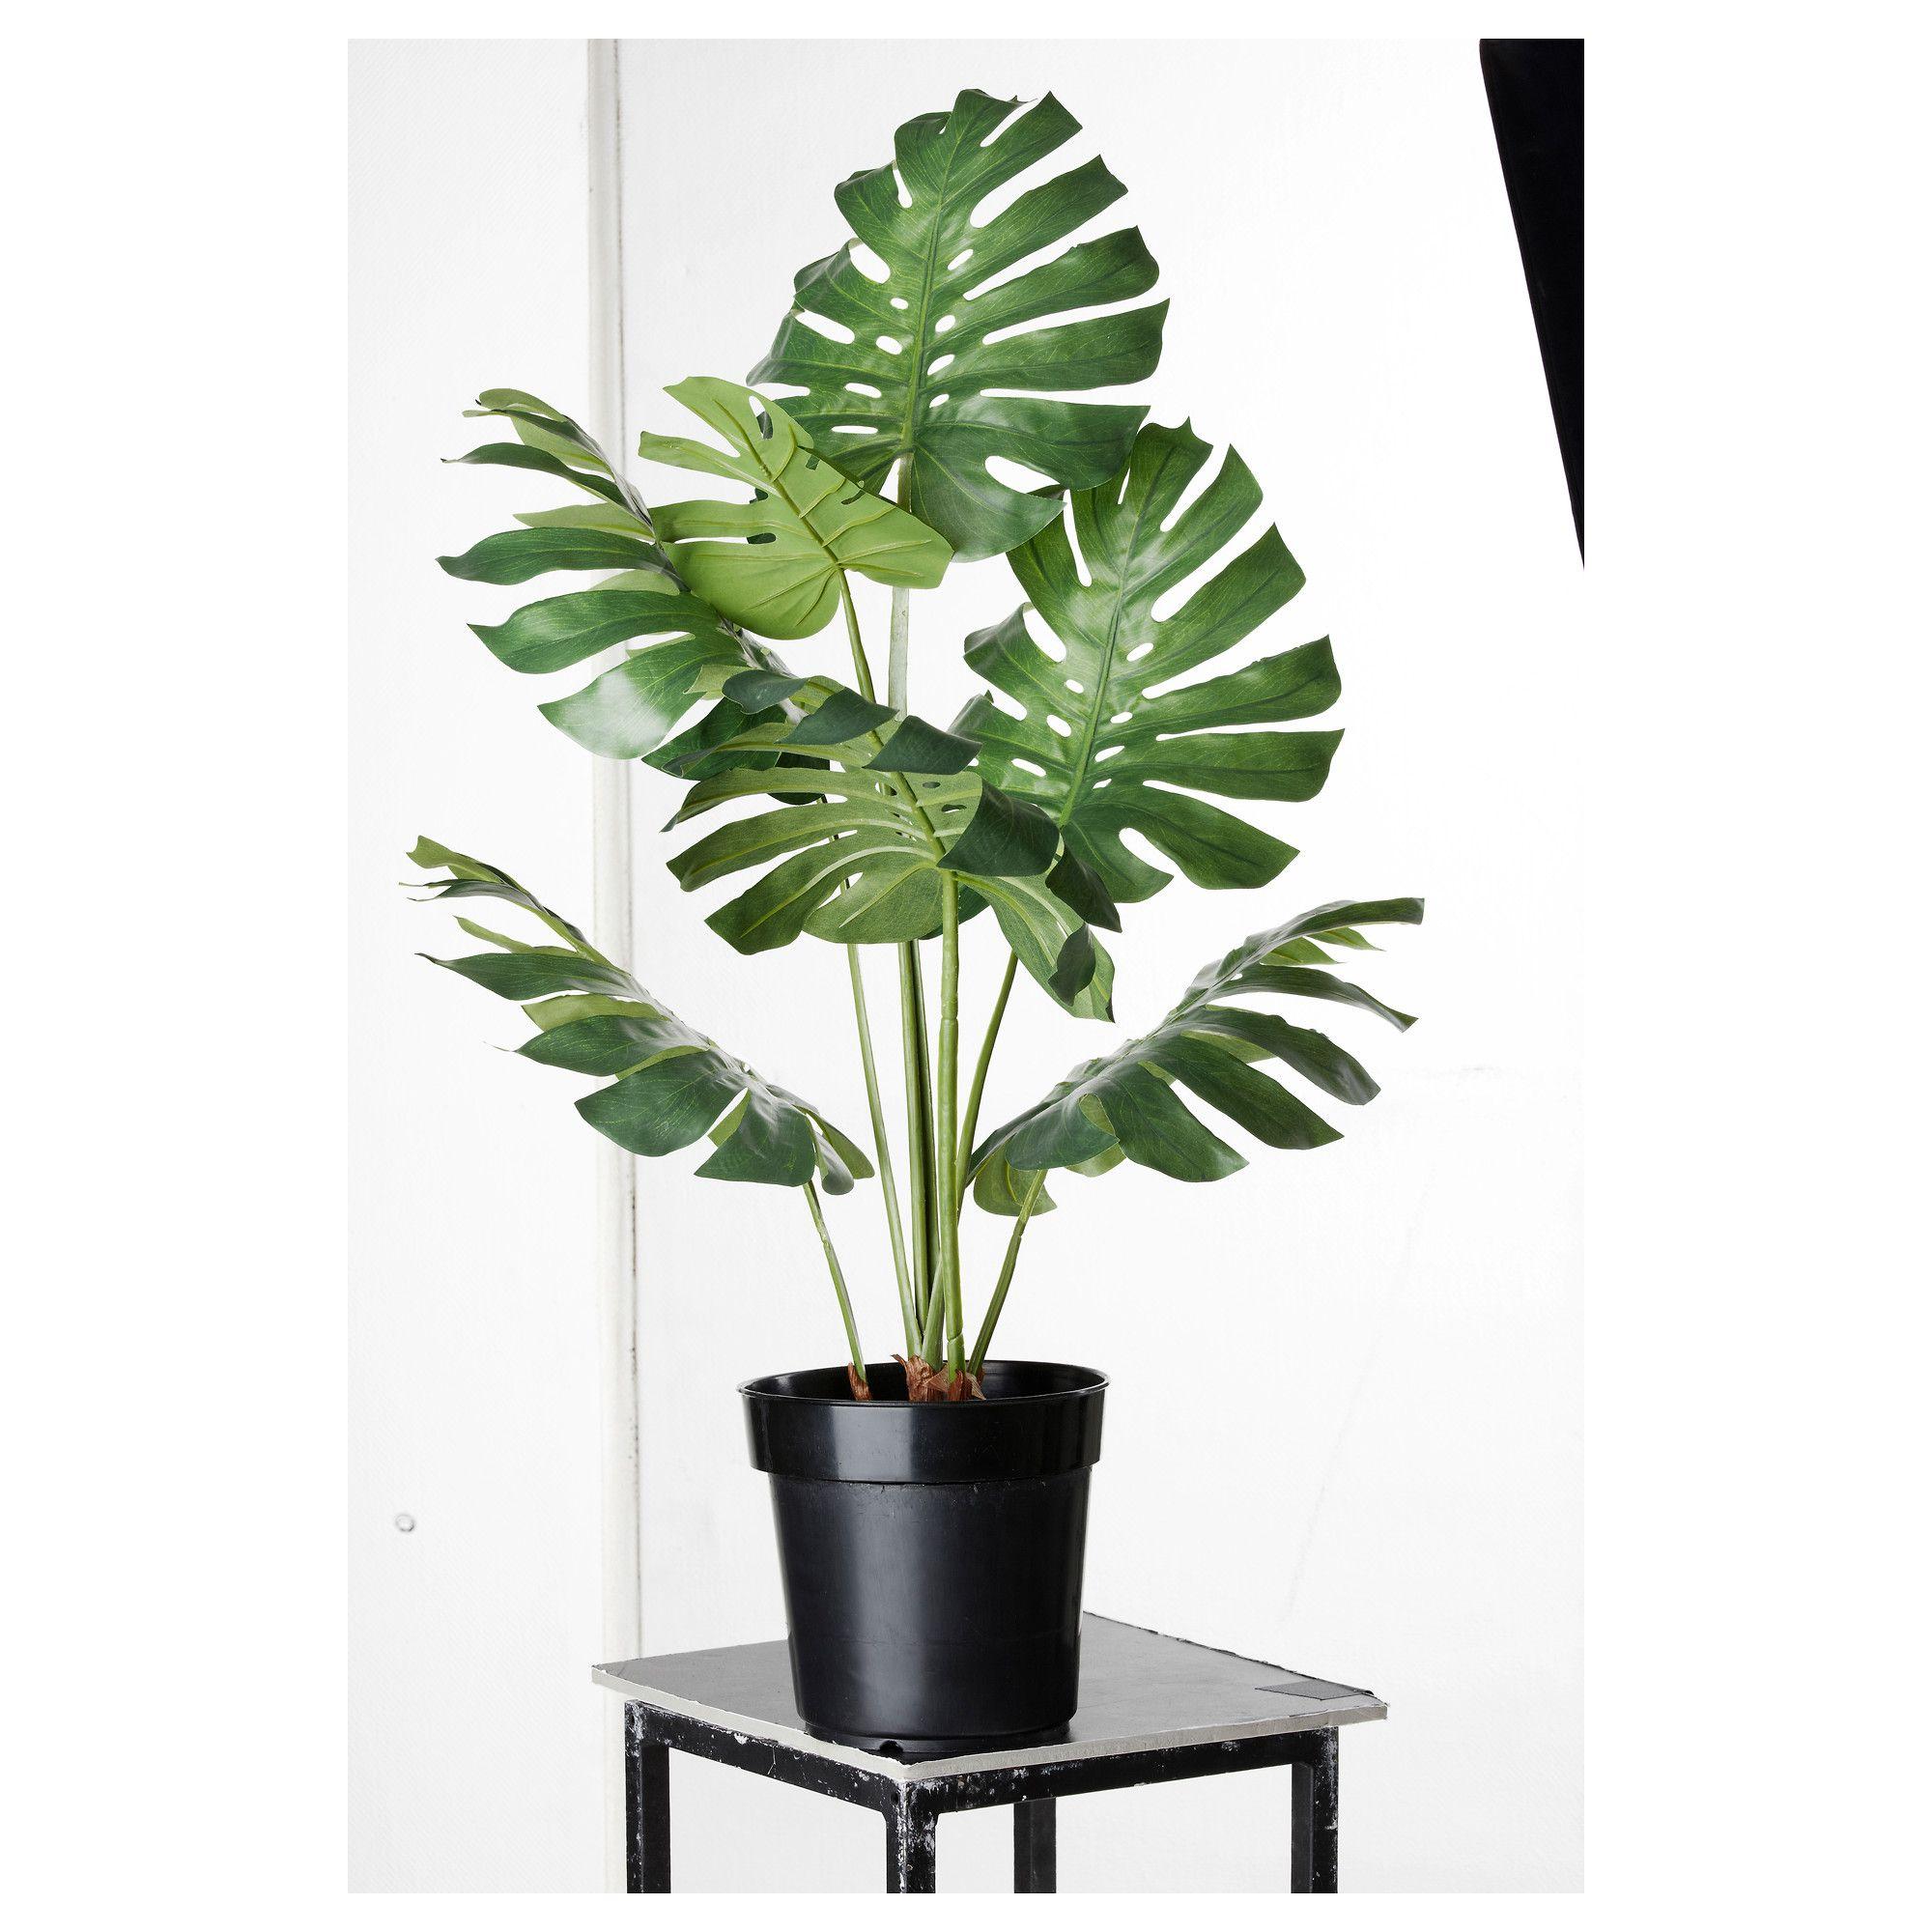 ikea 19 99 beach house hub bam hub competition pinterest plantes artificielles. Black Bedroom Furniture Sets. Home Design Ideas